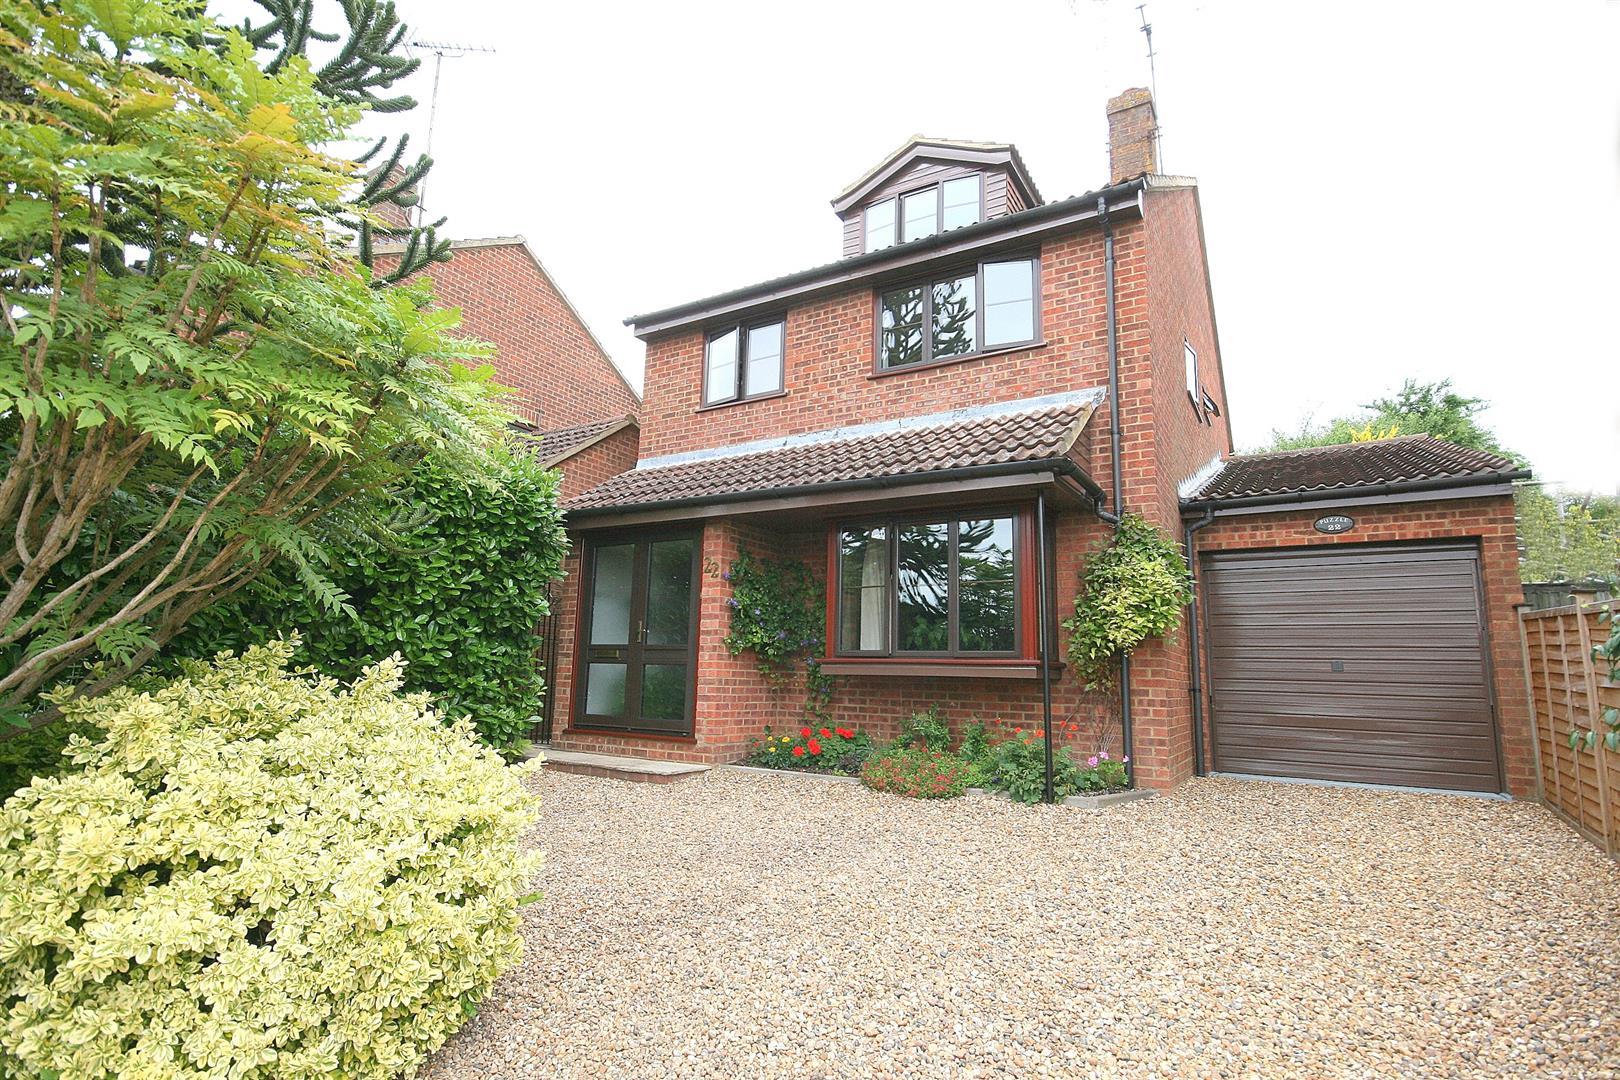 5 Bedrooms Property for sale in Stanbridge Road, Tilsworth, Beds